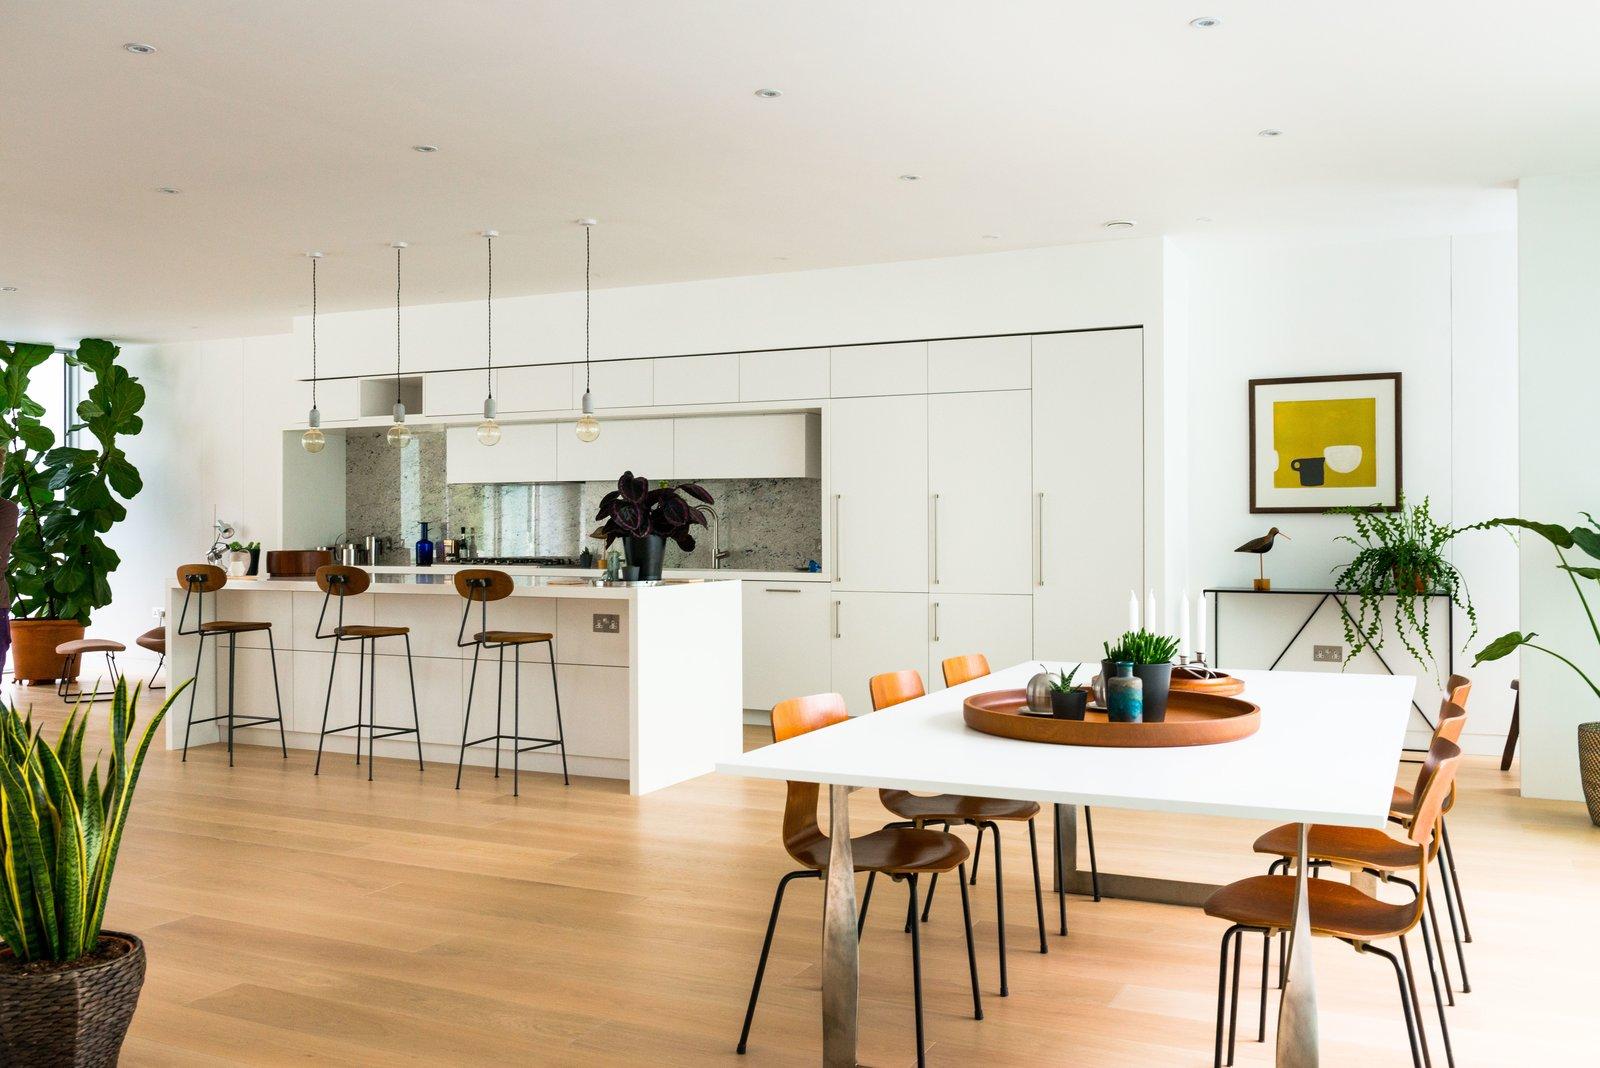 Photo 1 of 13 in Sleek, Modern Loft Apartments For Sale in a Heritage Neighborhood of London